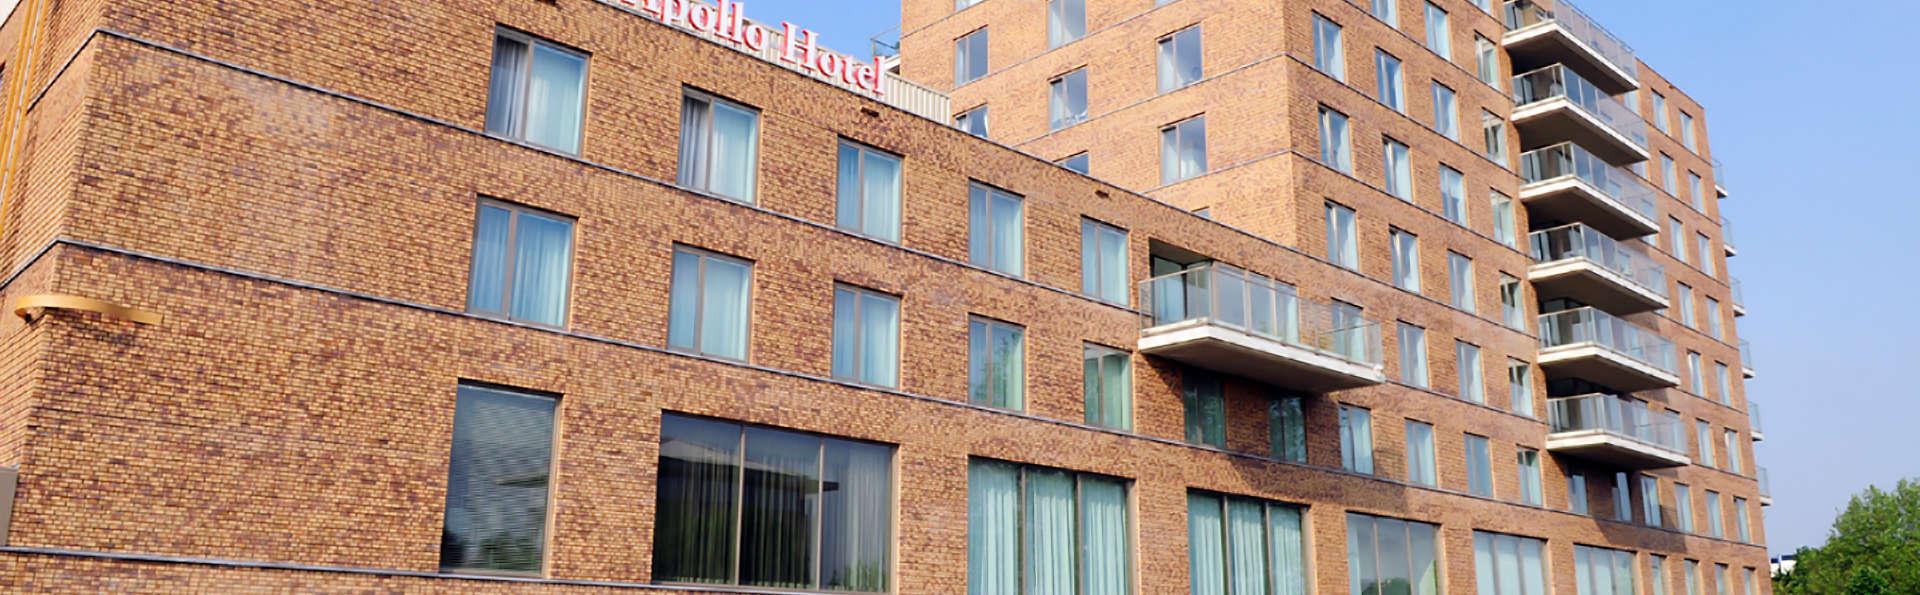 Apollo Hotel Papendrecht - Edit_Front.jpg